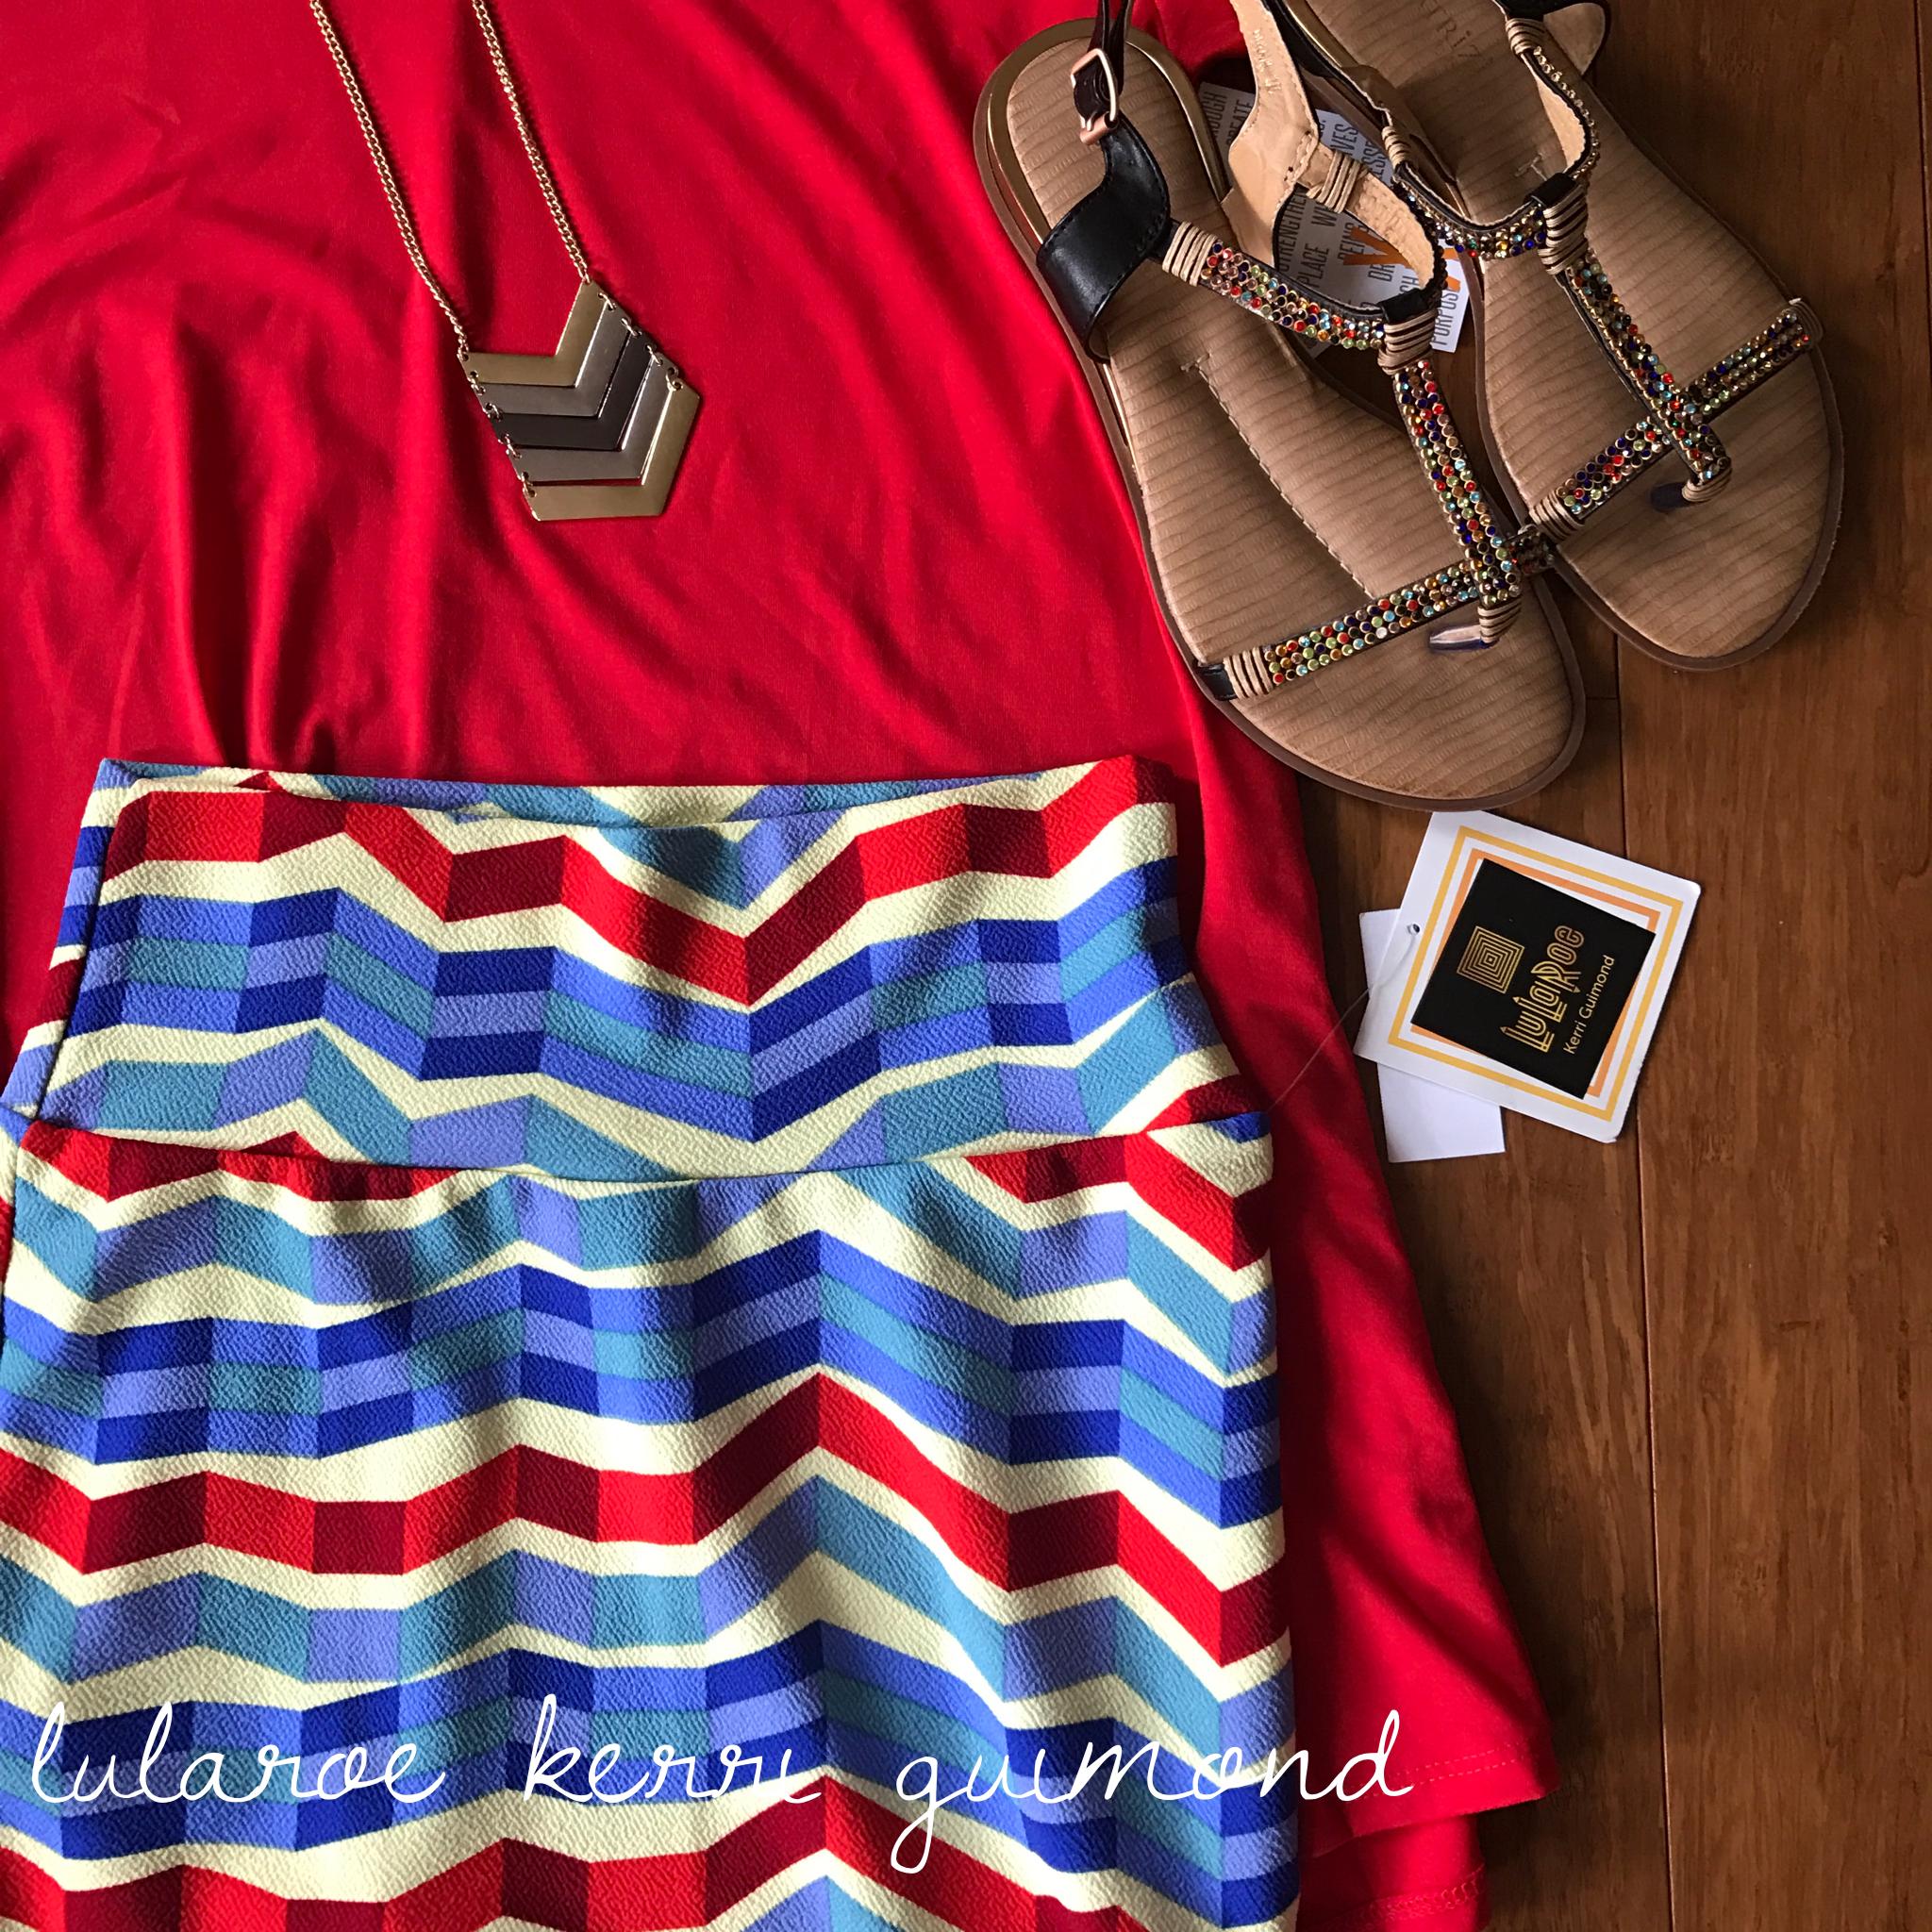 What a stunning lularoe Cassie skirt and perfect t combo!  https://www.instagram.com/lularoekerriguimond/